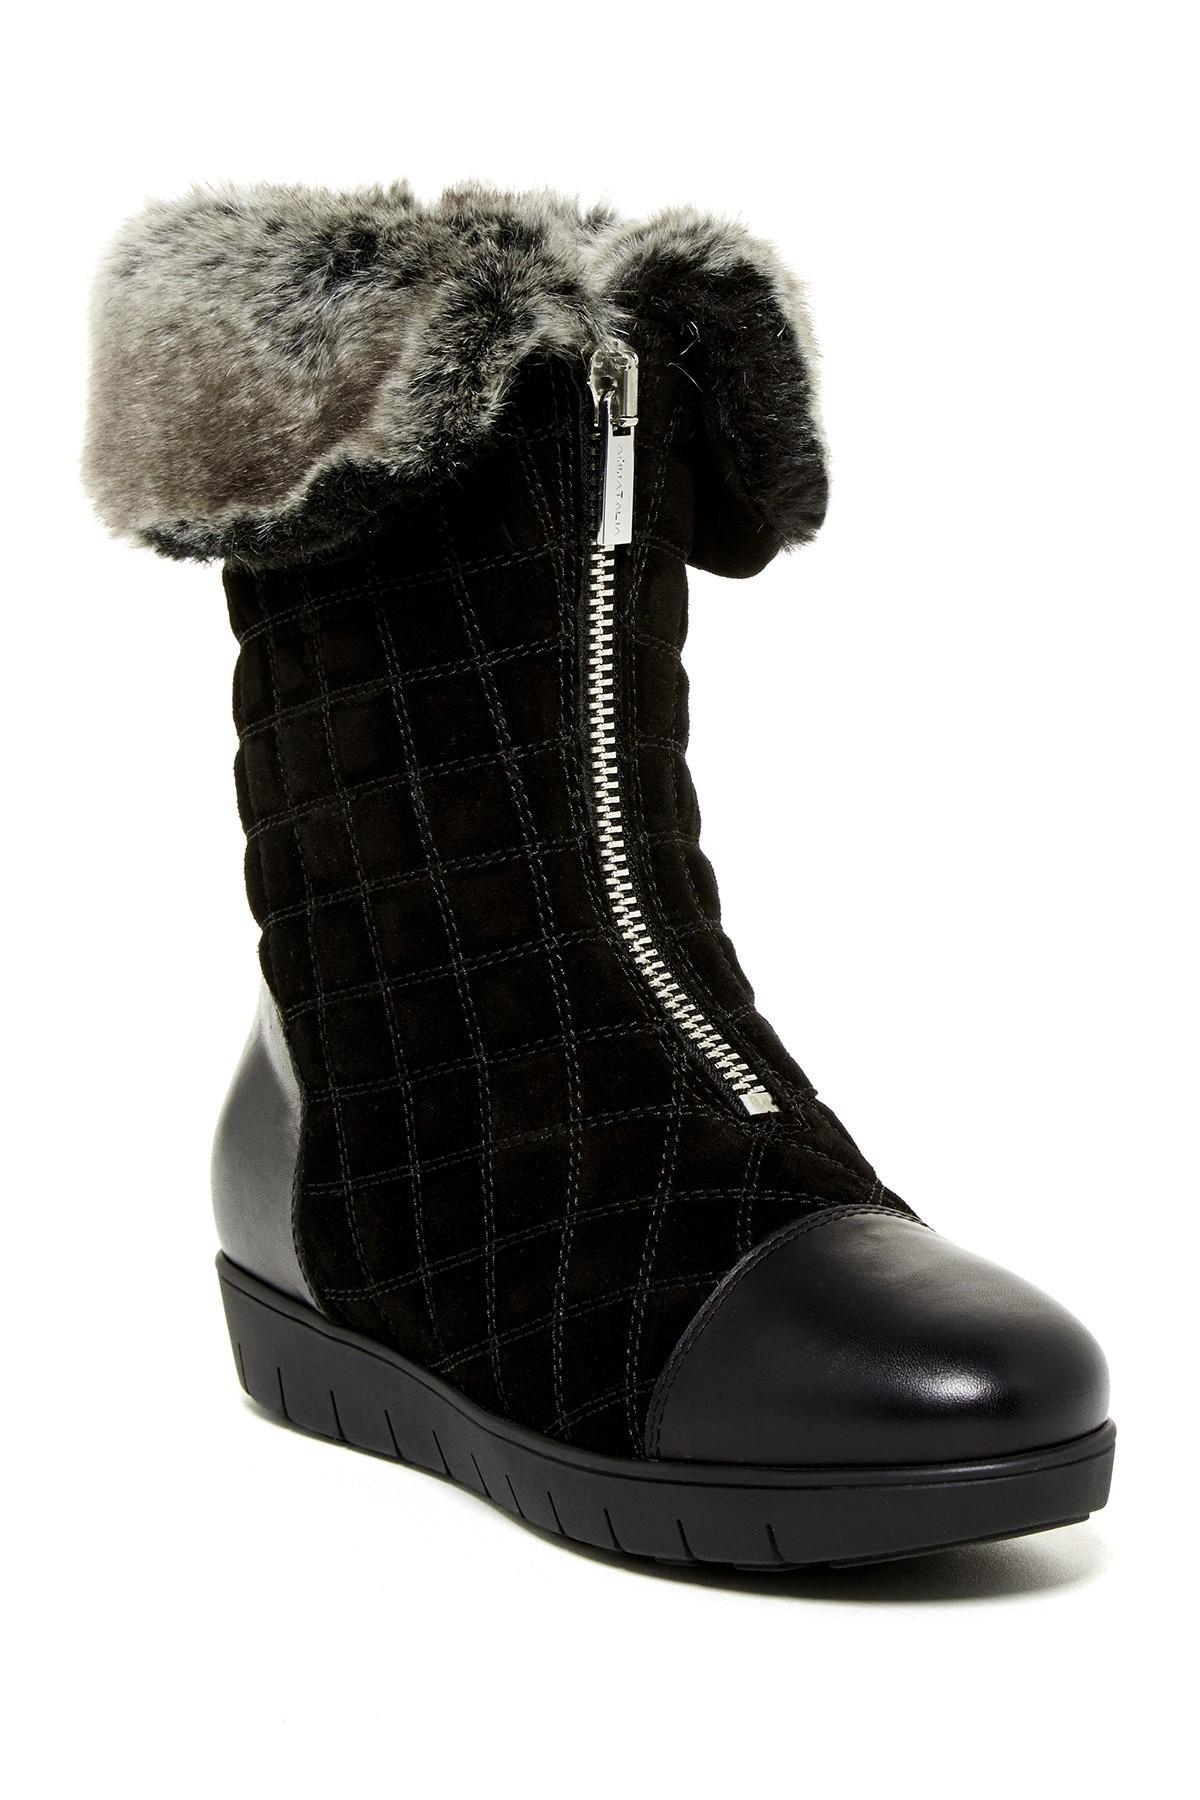 aquatalia wanda faux fur lined boot in black lyst